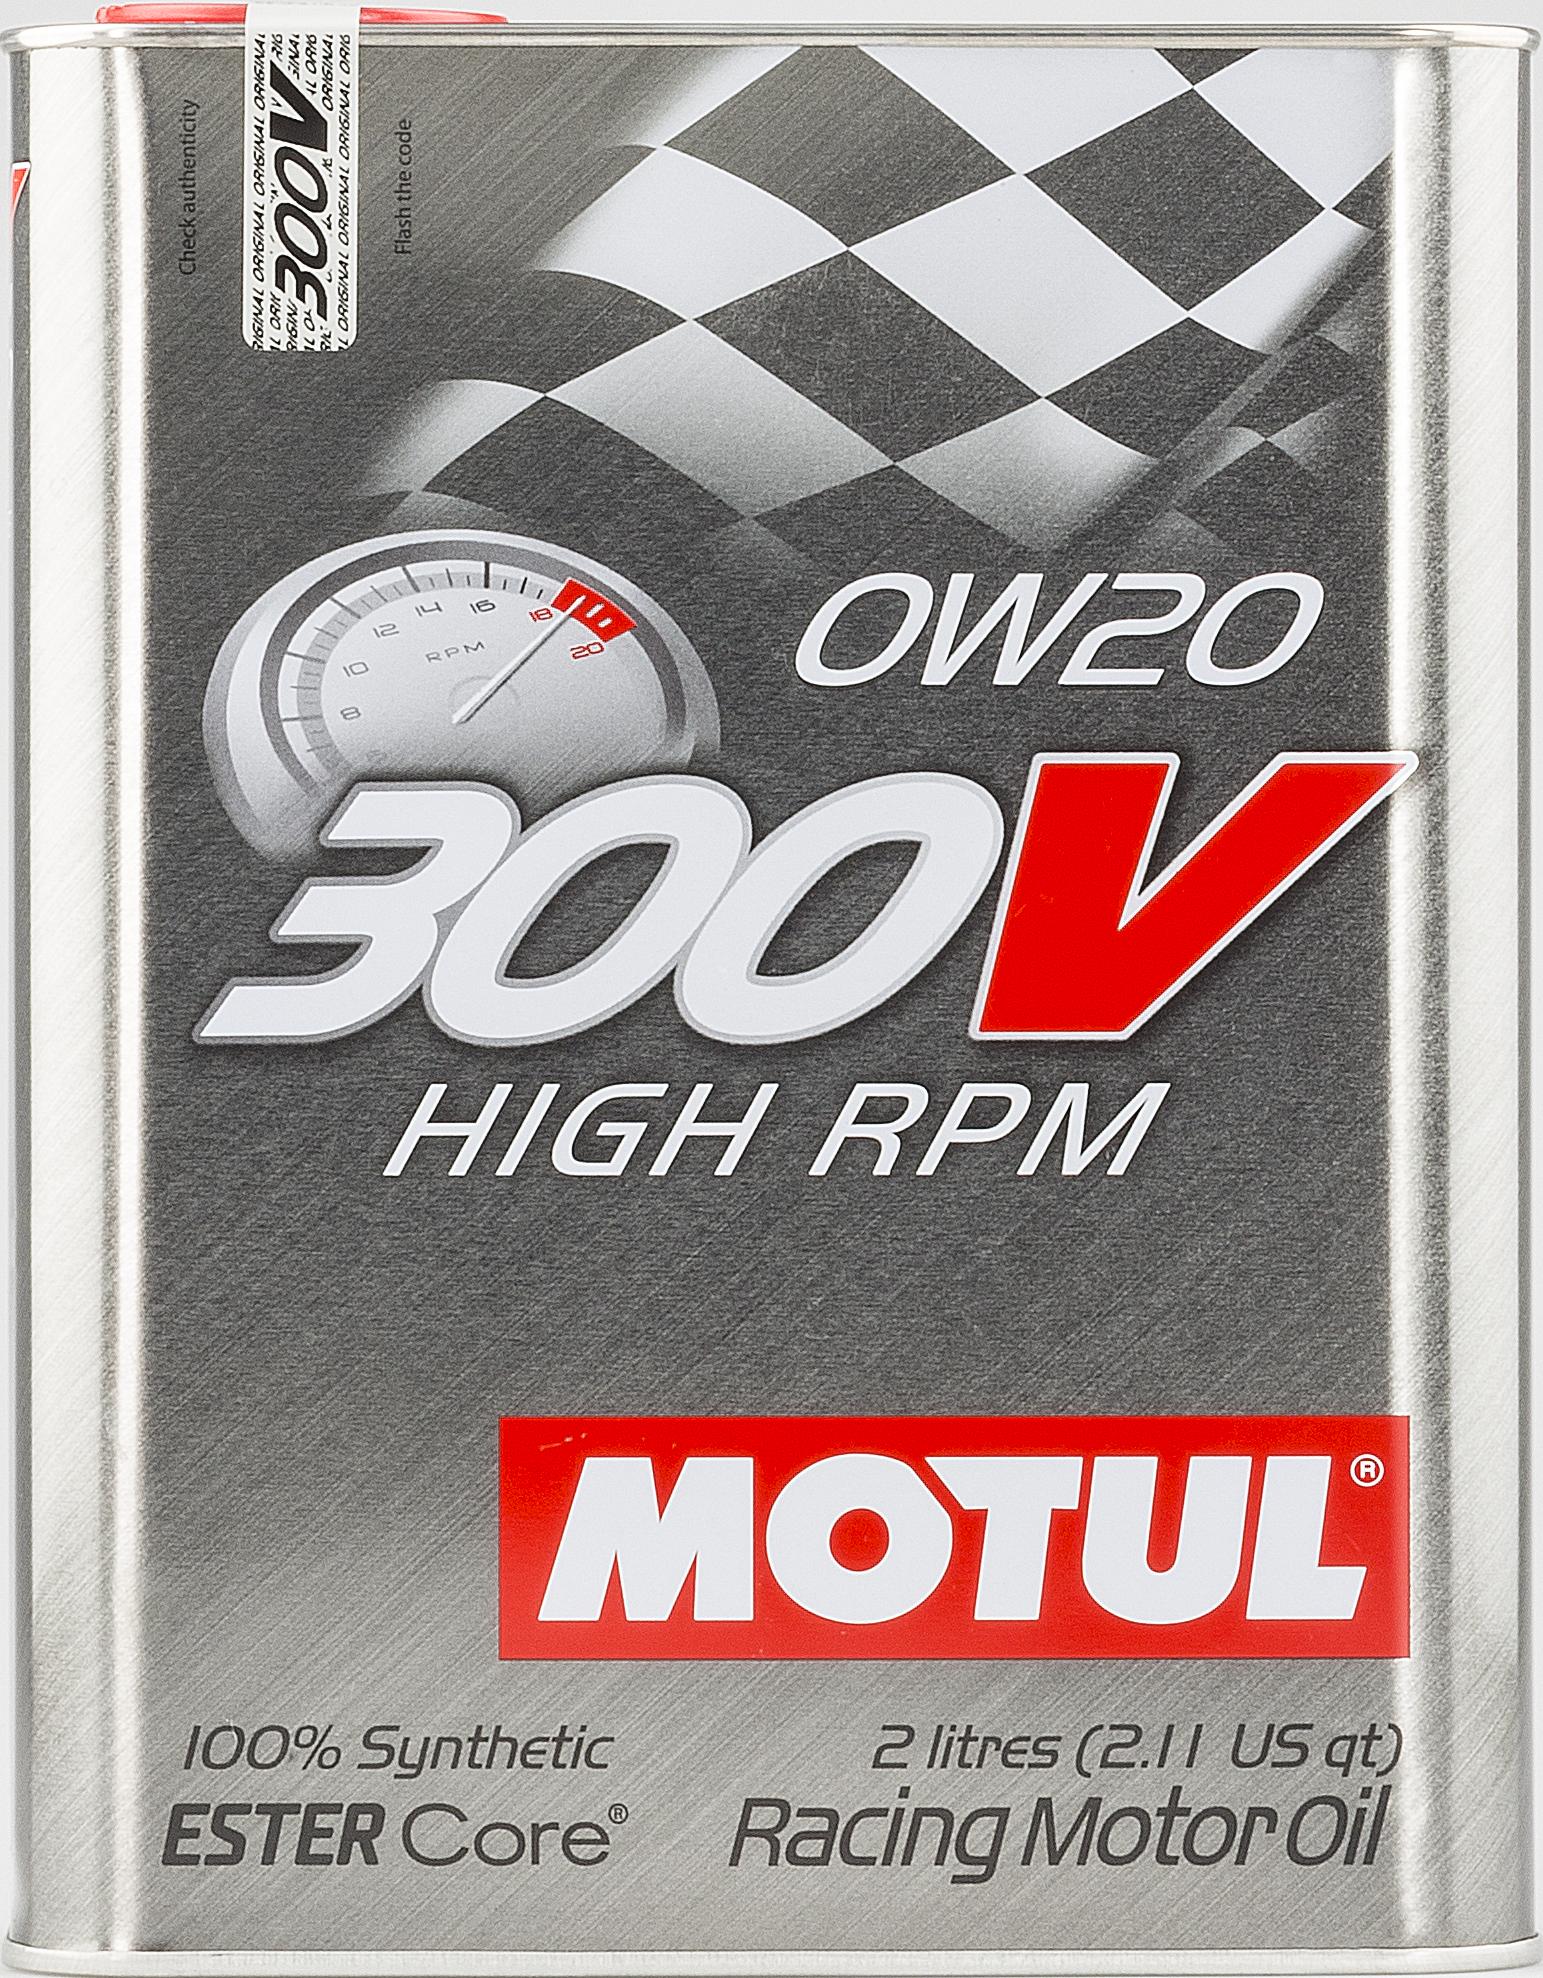 HUILE MOTEUR 300V HIGH RPM 0W20 2L